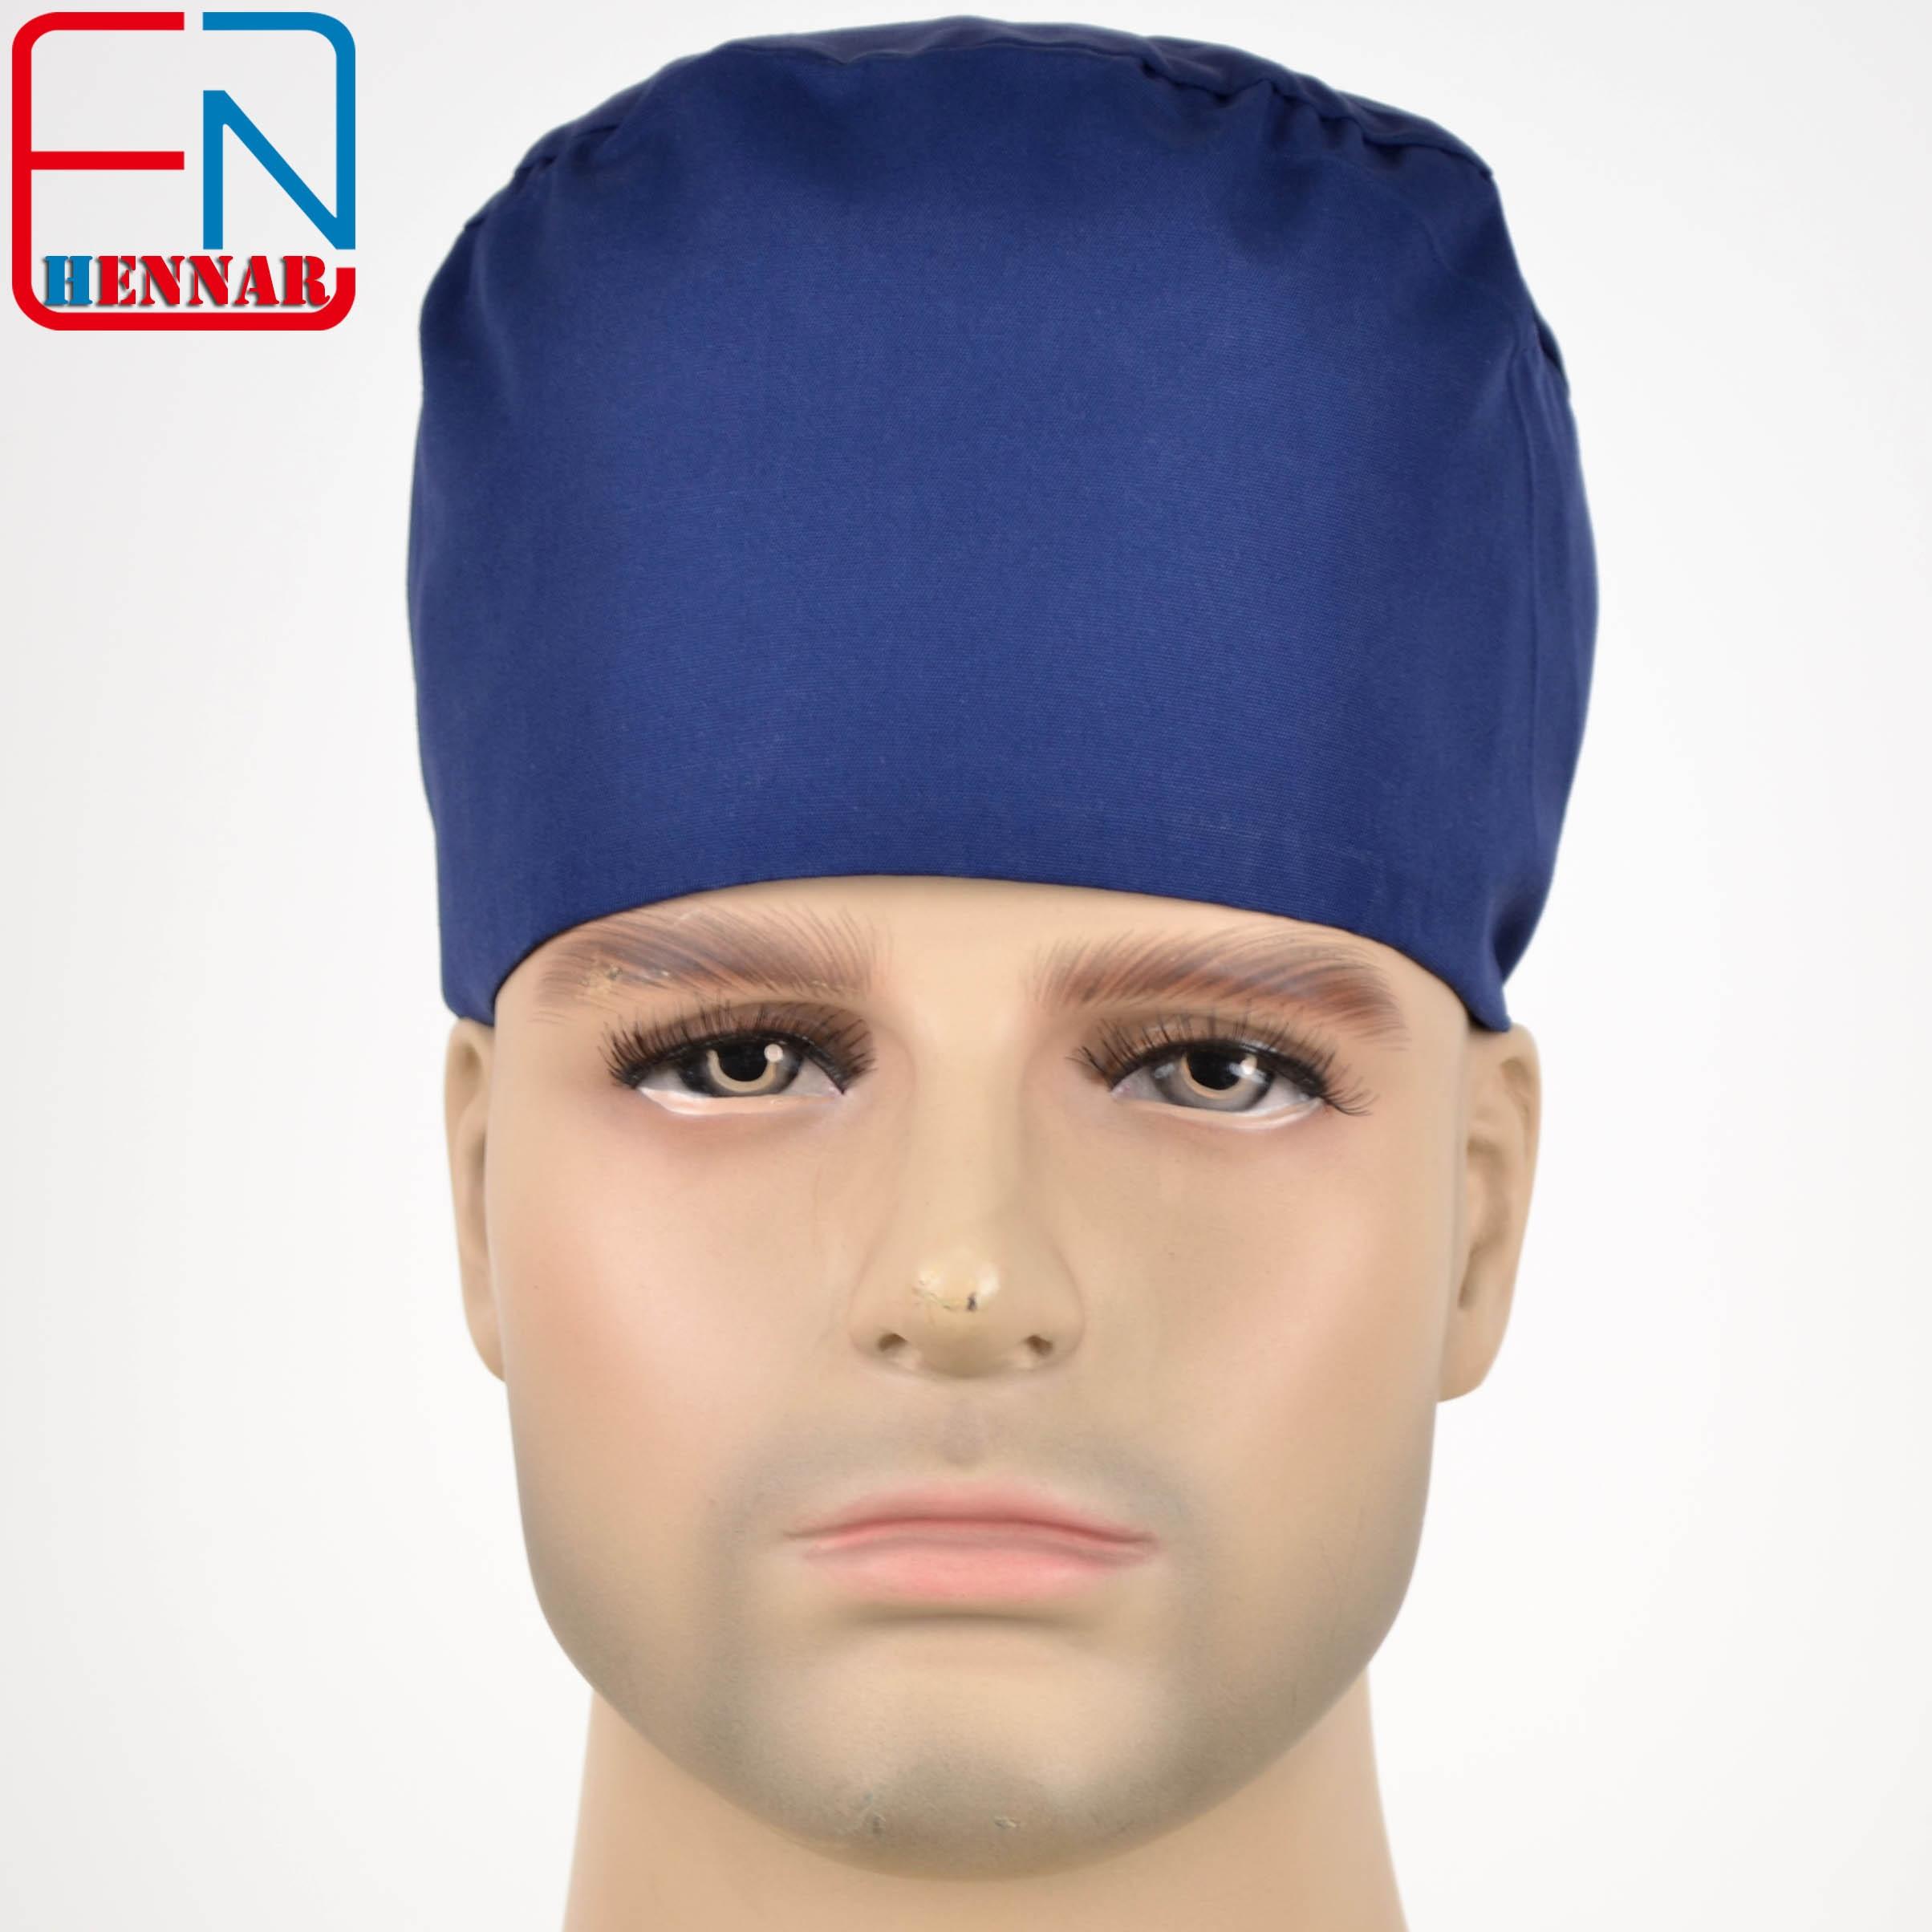 Hennar Surgical Scrub Caps  Navy Blue Mens Scrub Caps High Quality Gourd Hats Clinic Hospital Surgical Laboratory Pharmacy Caps